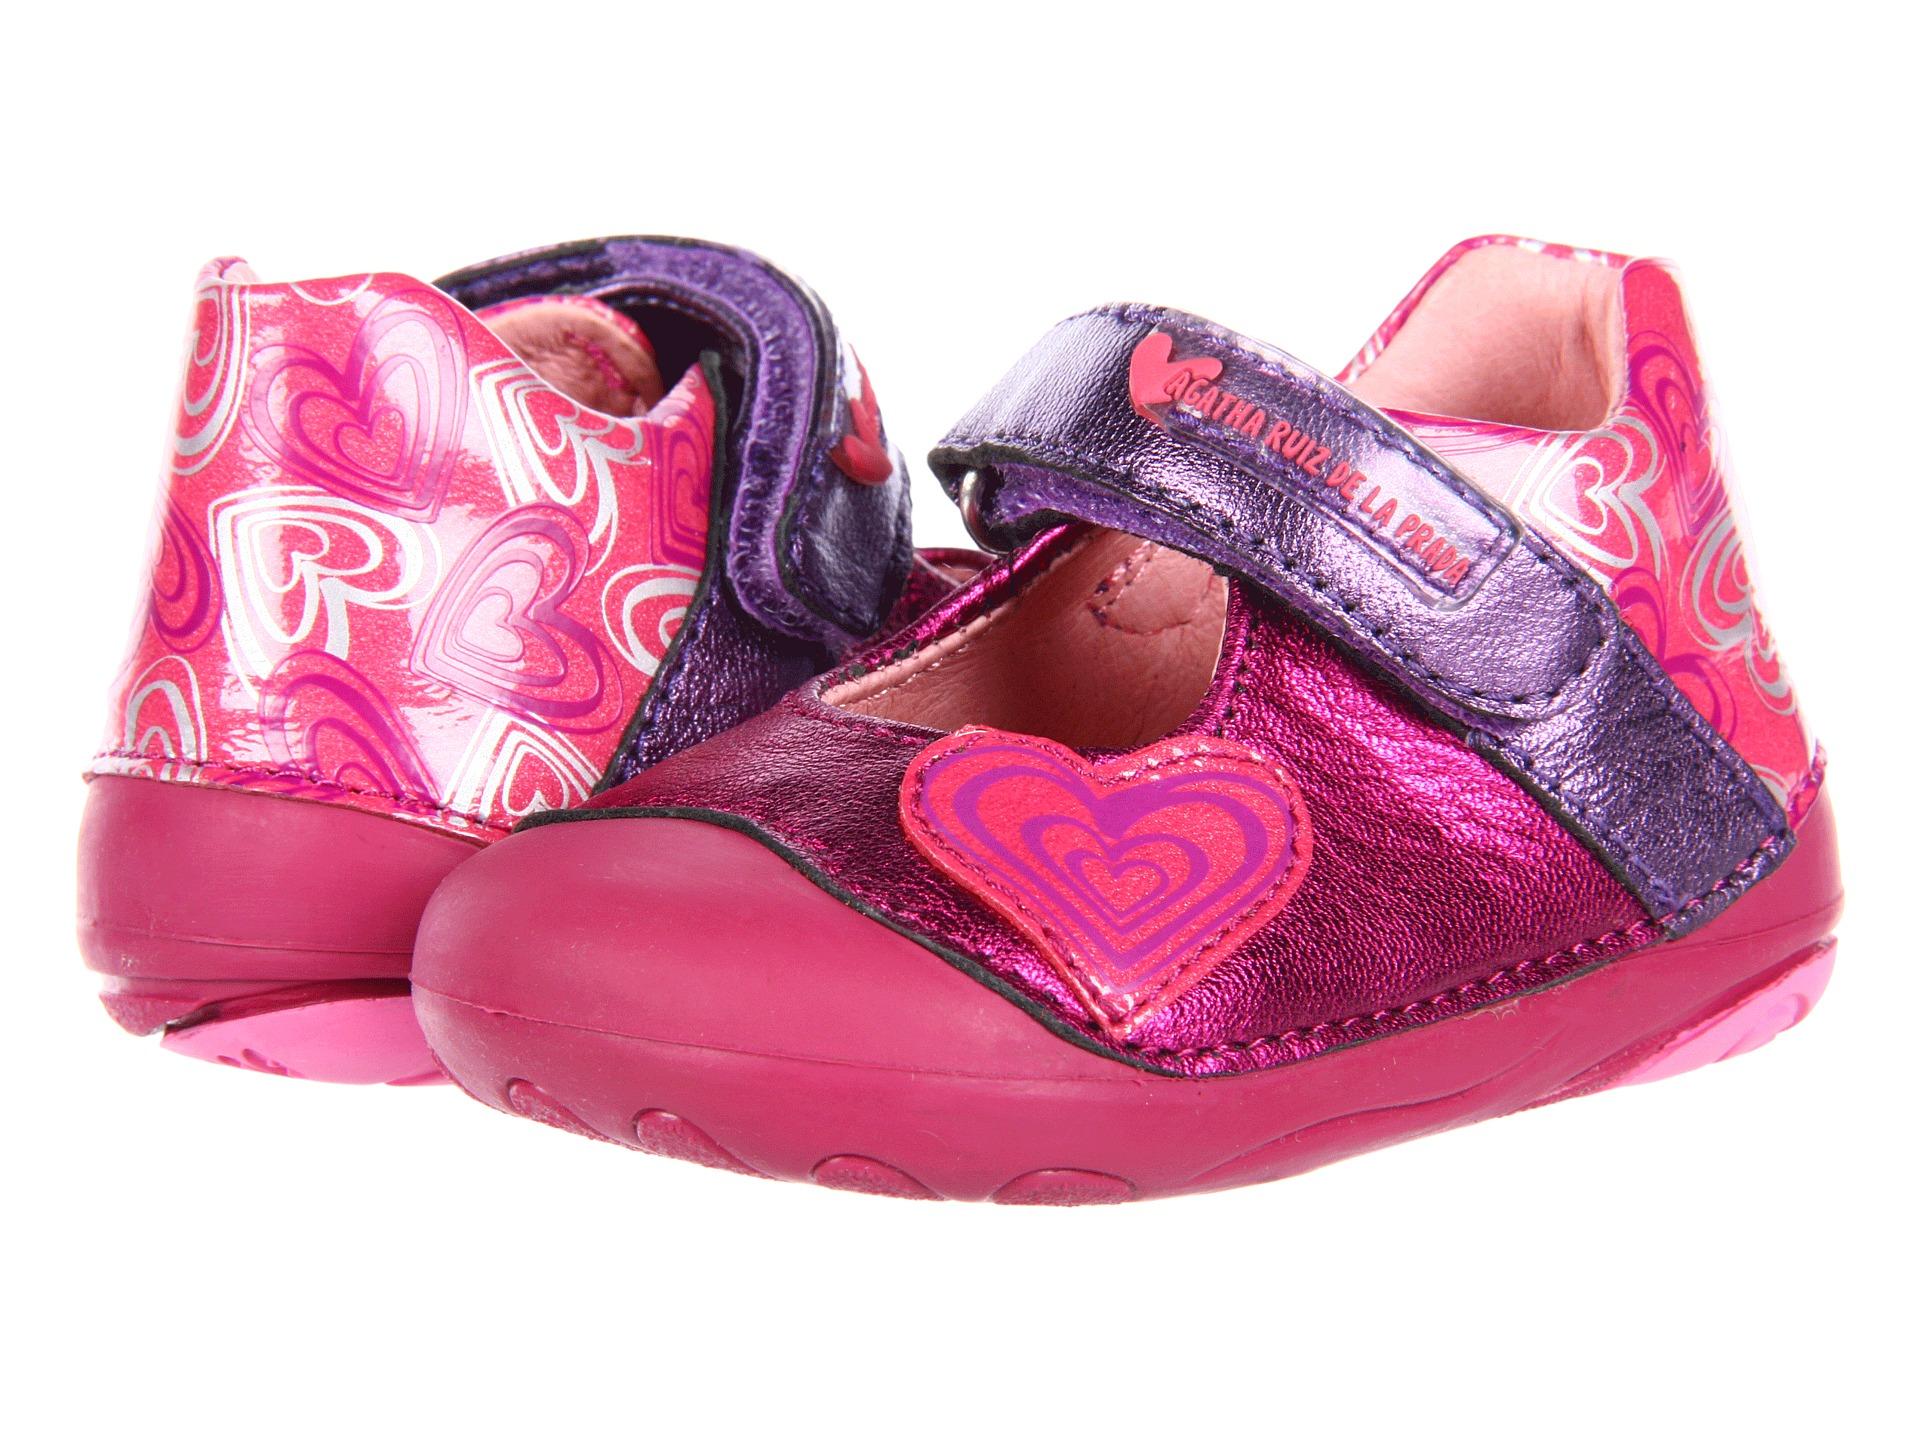 Ruiz De La Prada Kids 121913 (Infant/Toddler) $50.99 $73.00 SALE